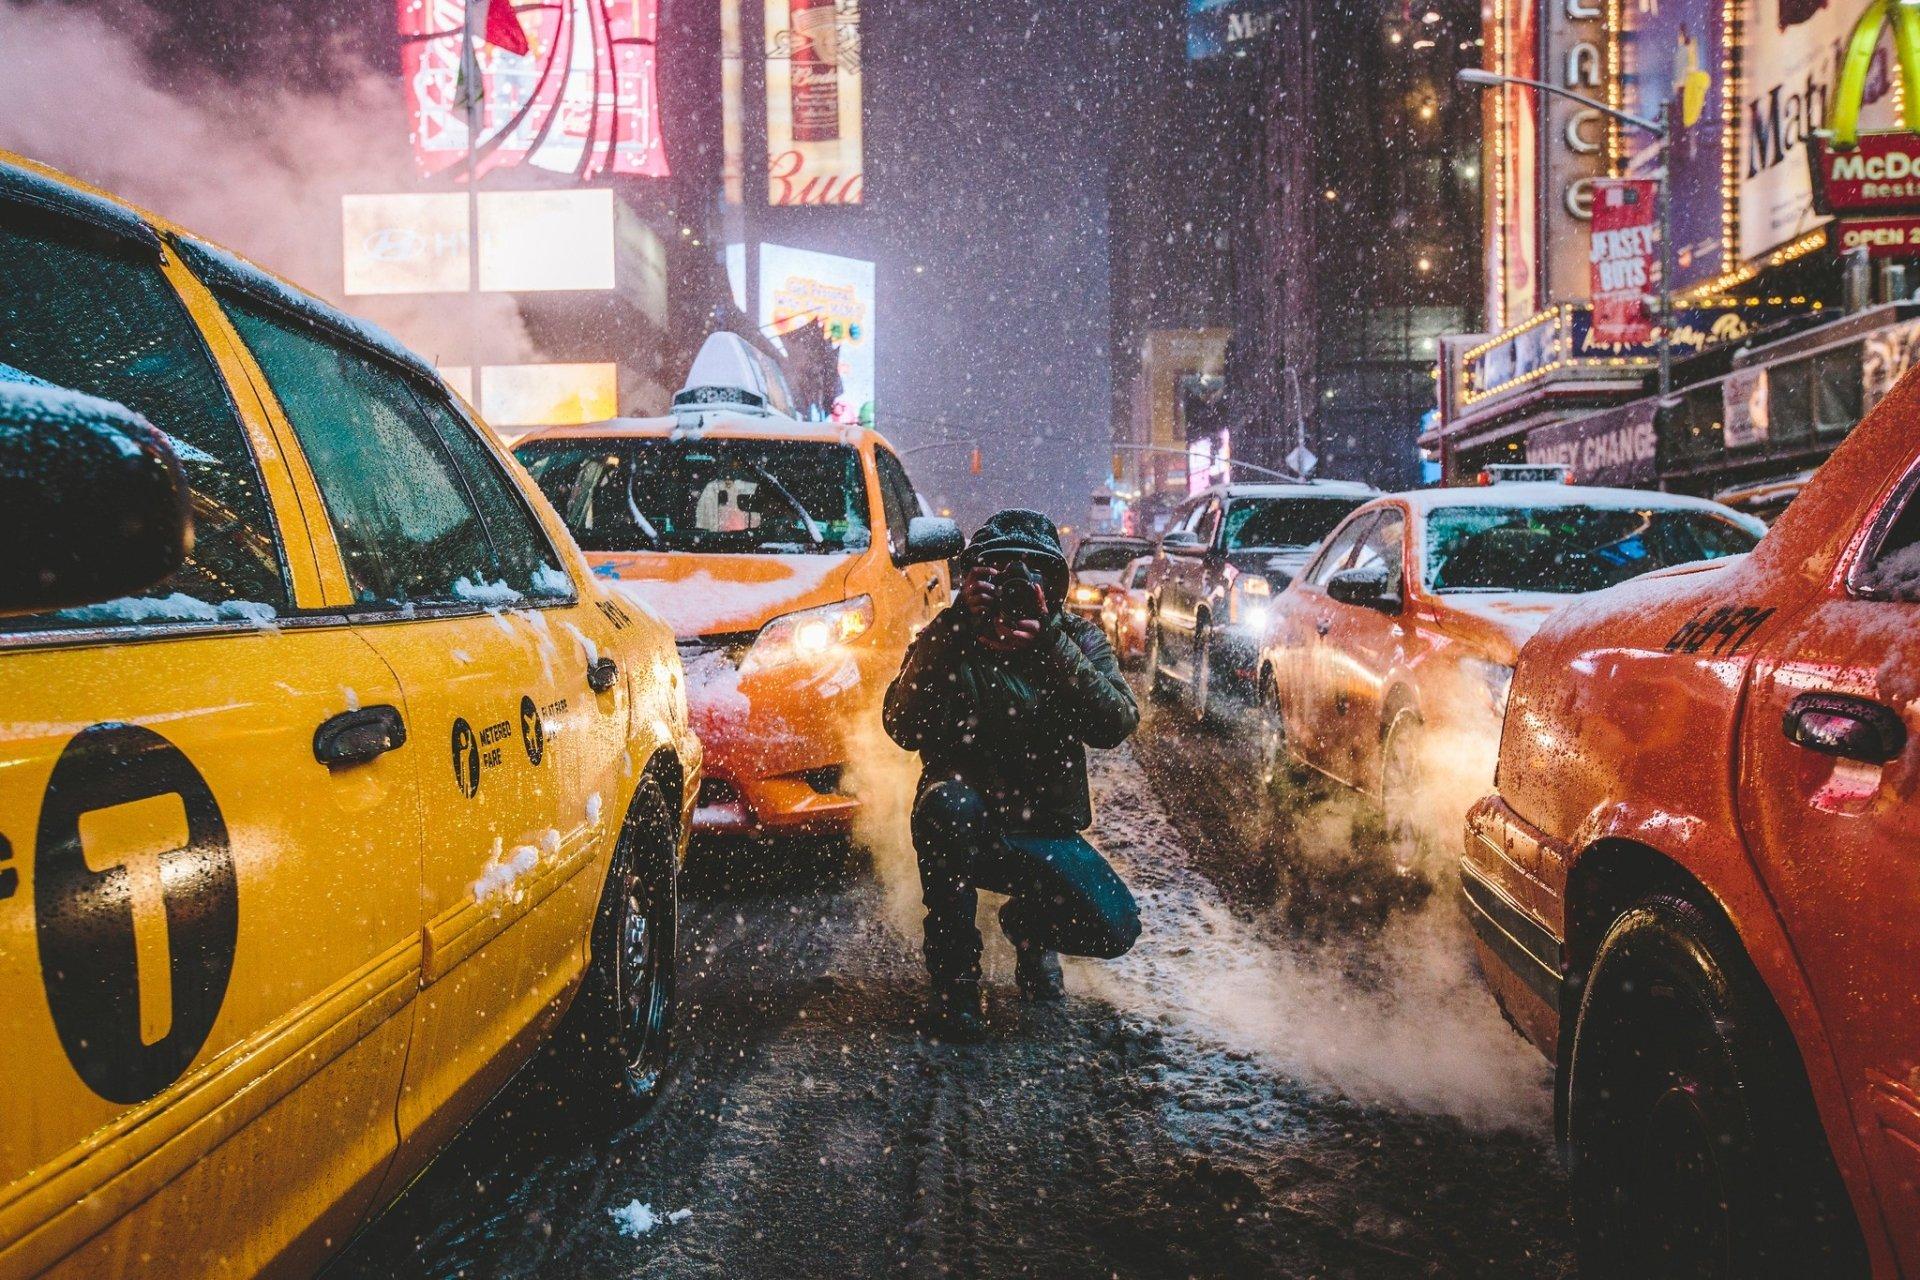 Man Made - Camera  Car Night Winter USA New York Taxi Street Snowfall Wallpaper